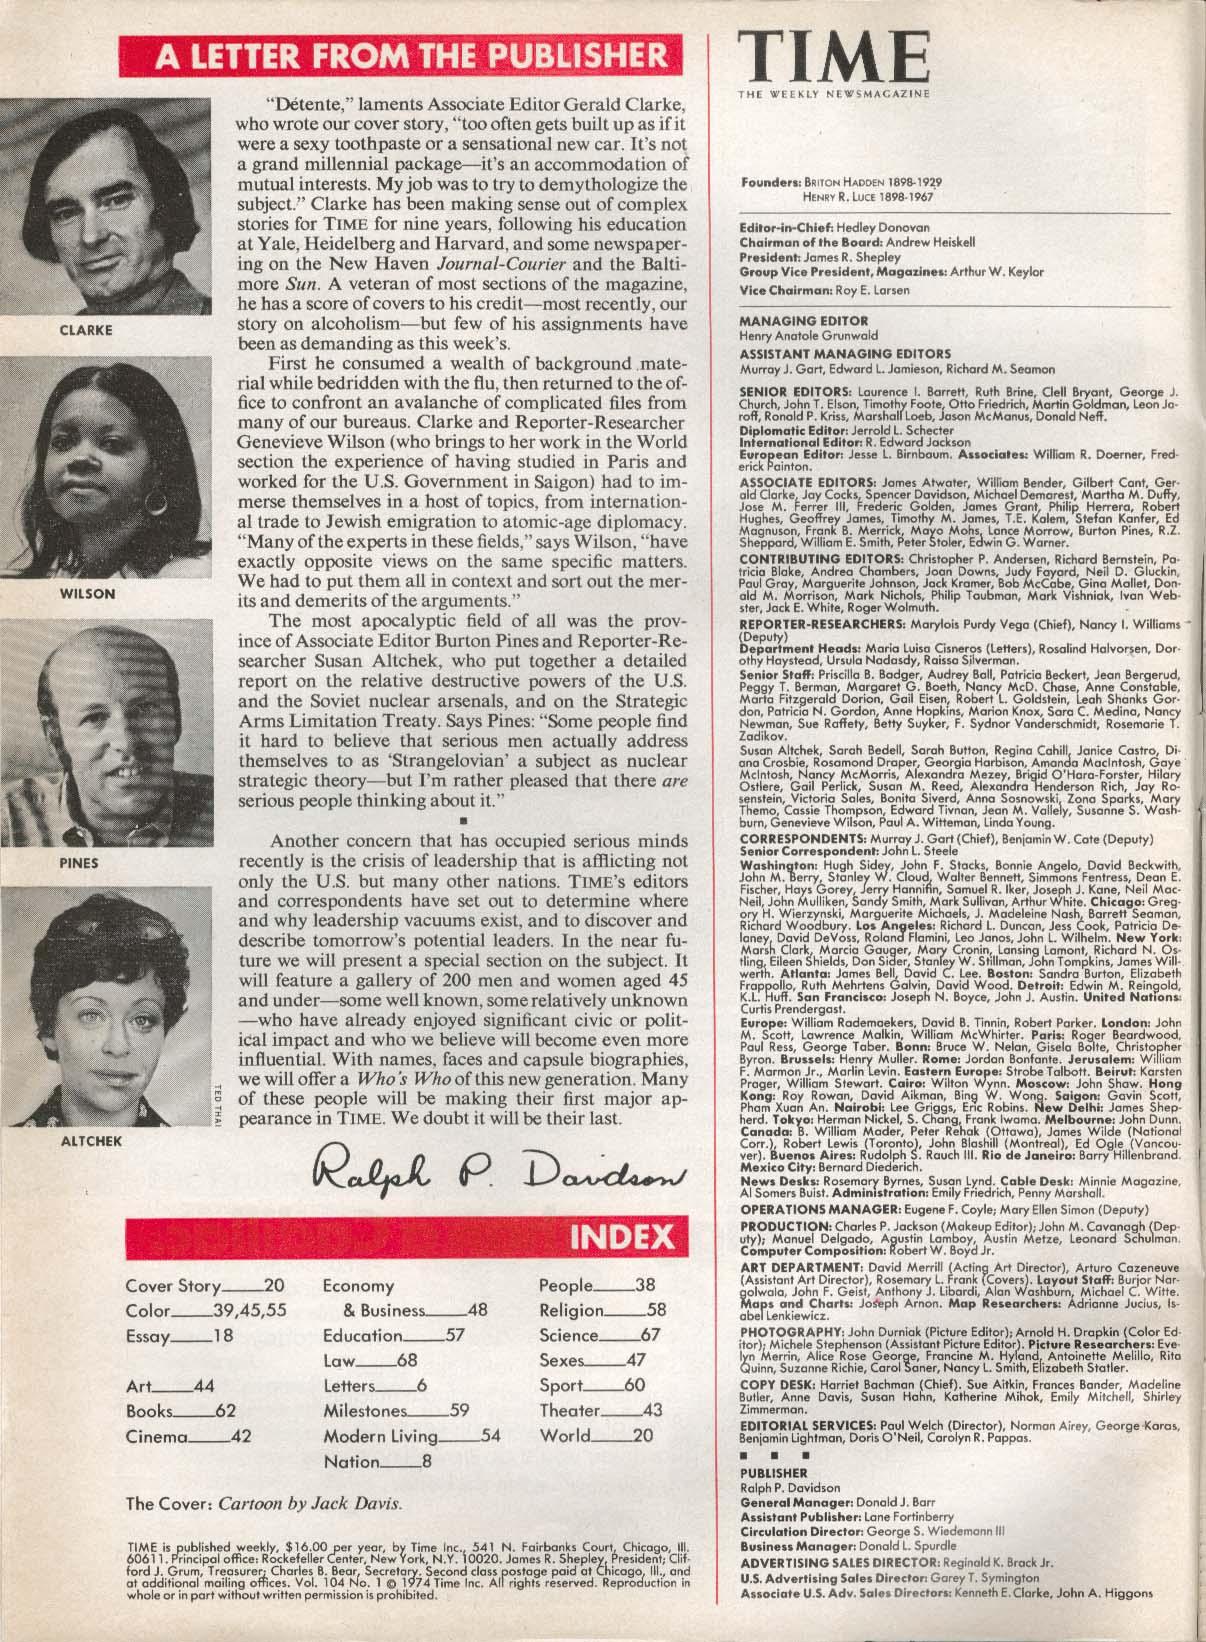 TIME Détente Brezhnev Nixon Jack Davis Watergate Schlesinger 7/1 1974